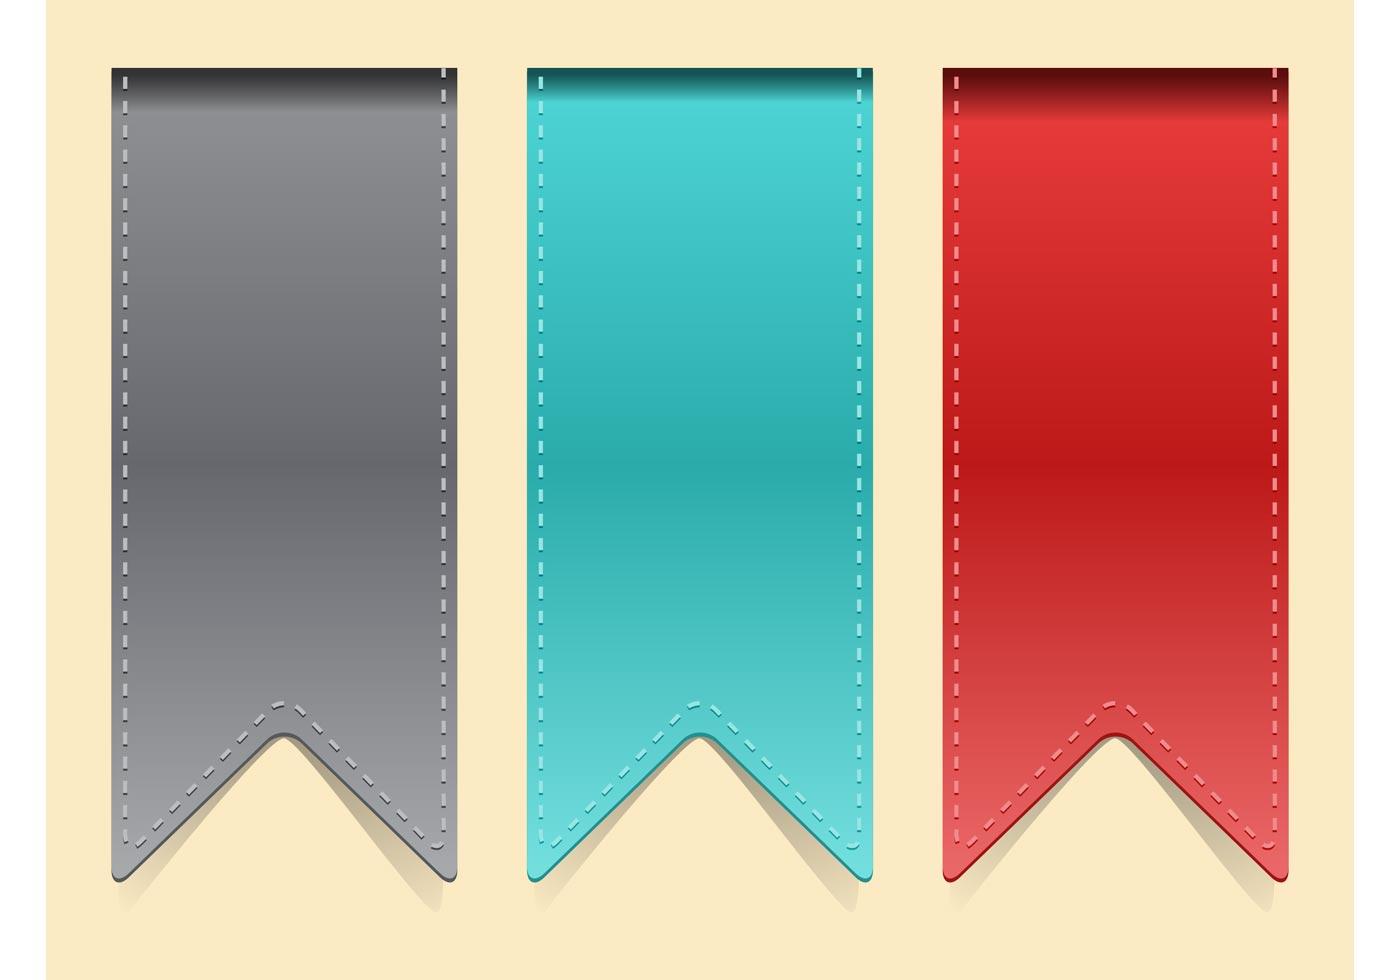 Bookmark Free Vector Art - (20220 Free Downloads)